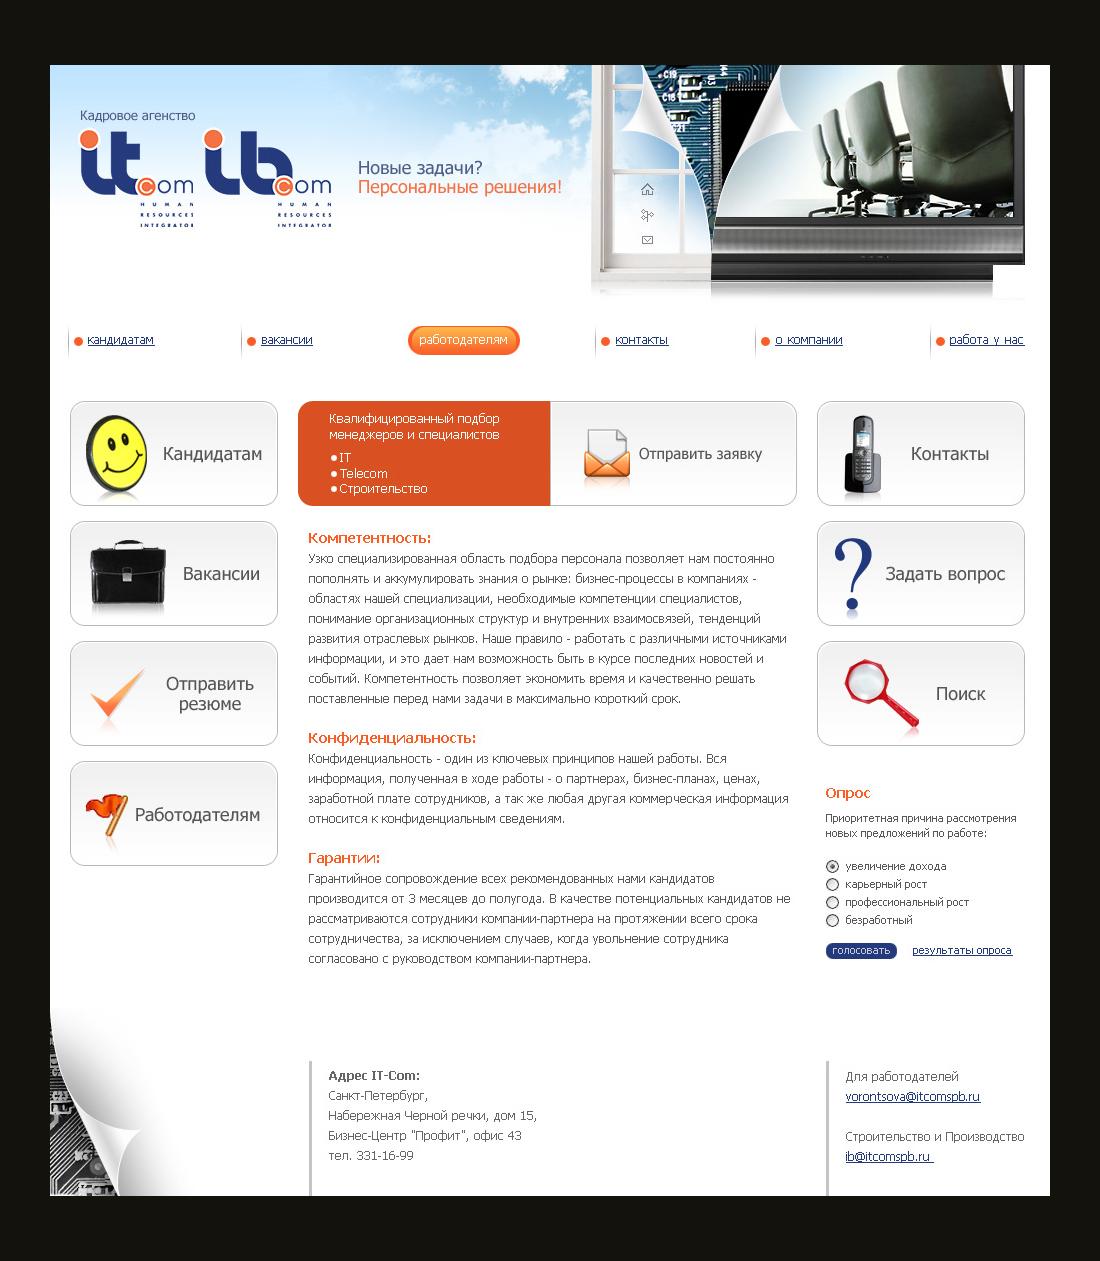 itcomspb.ru